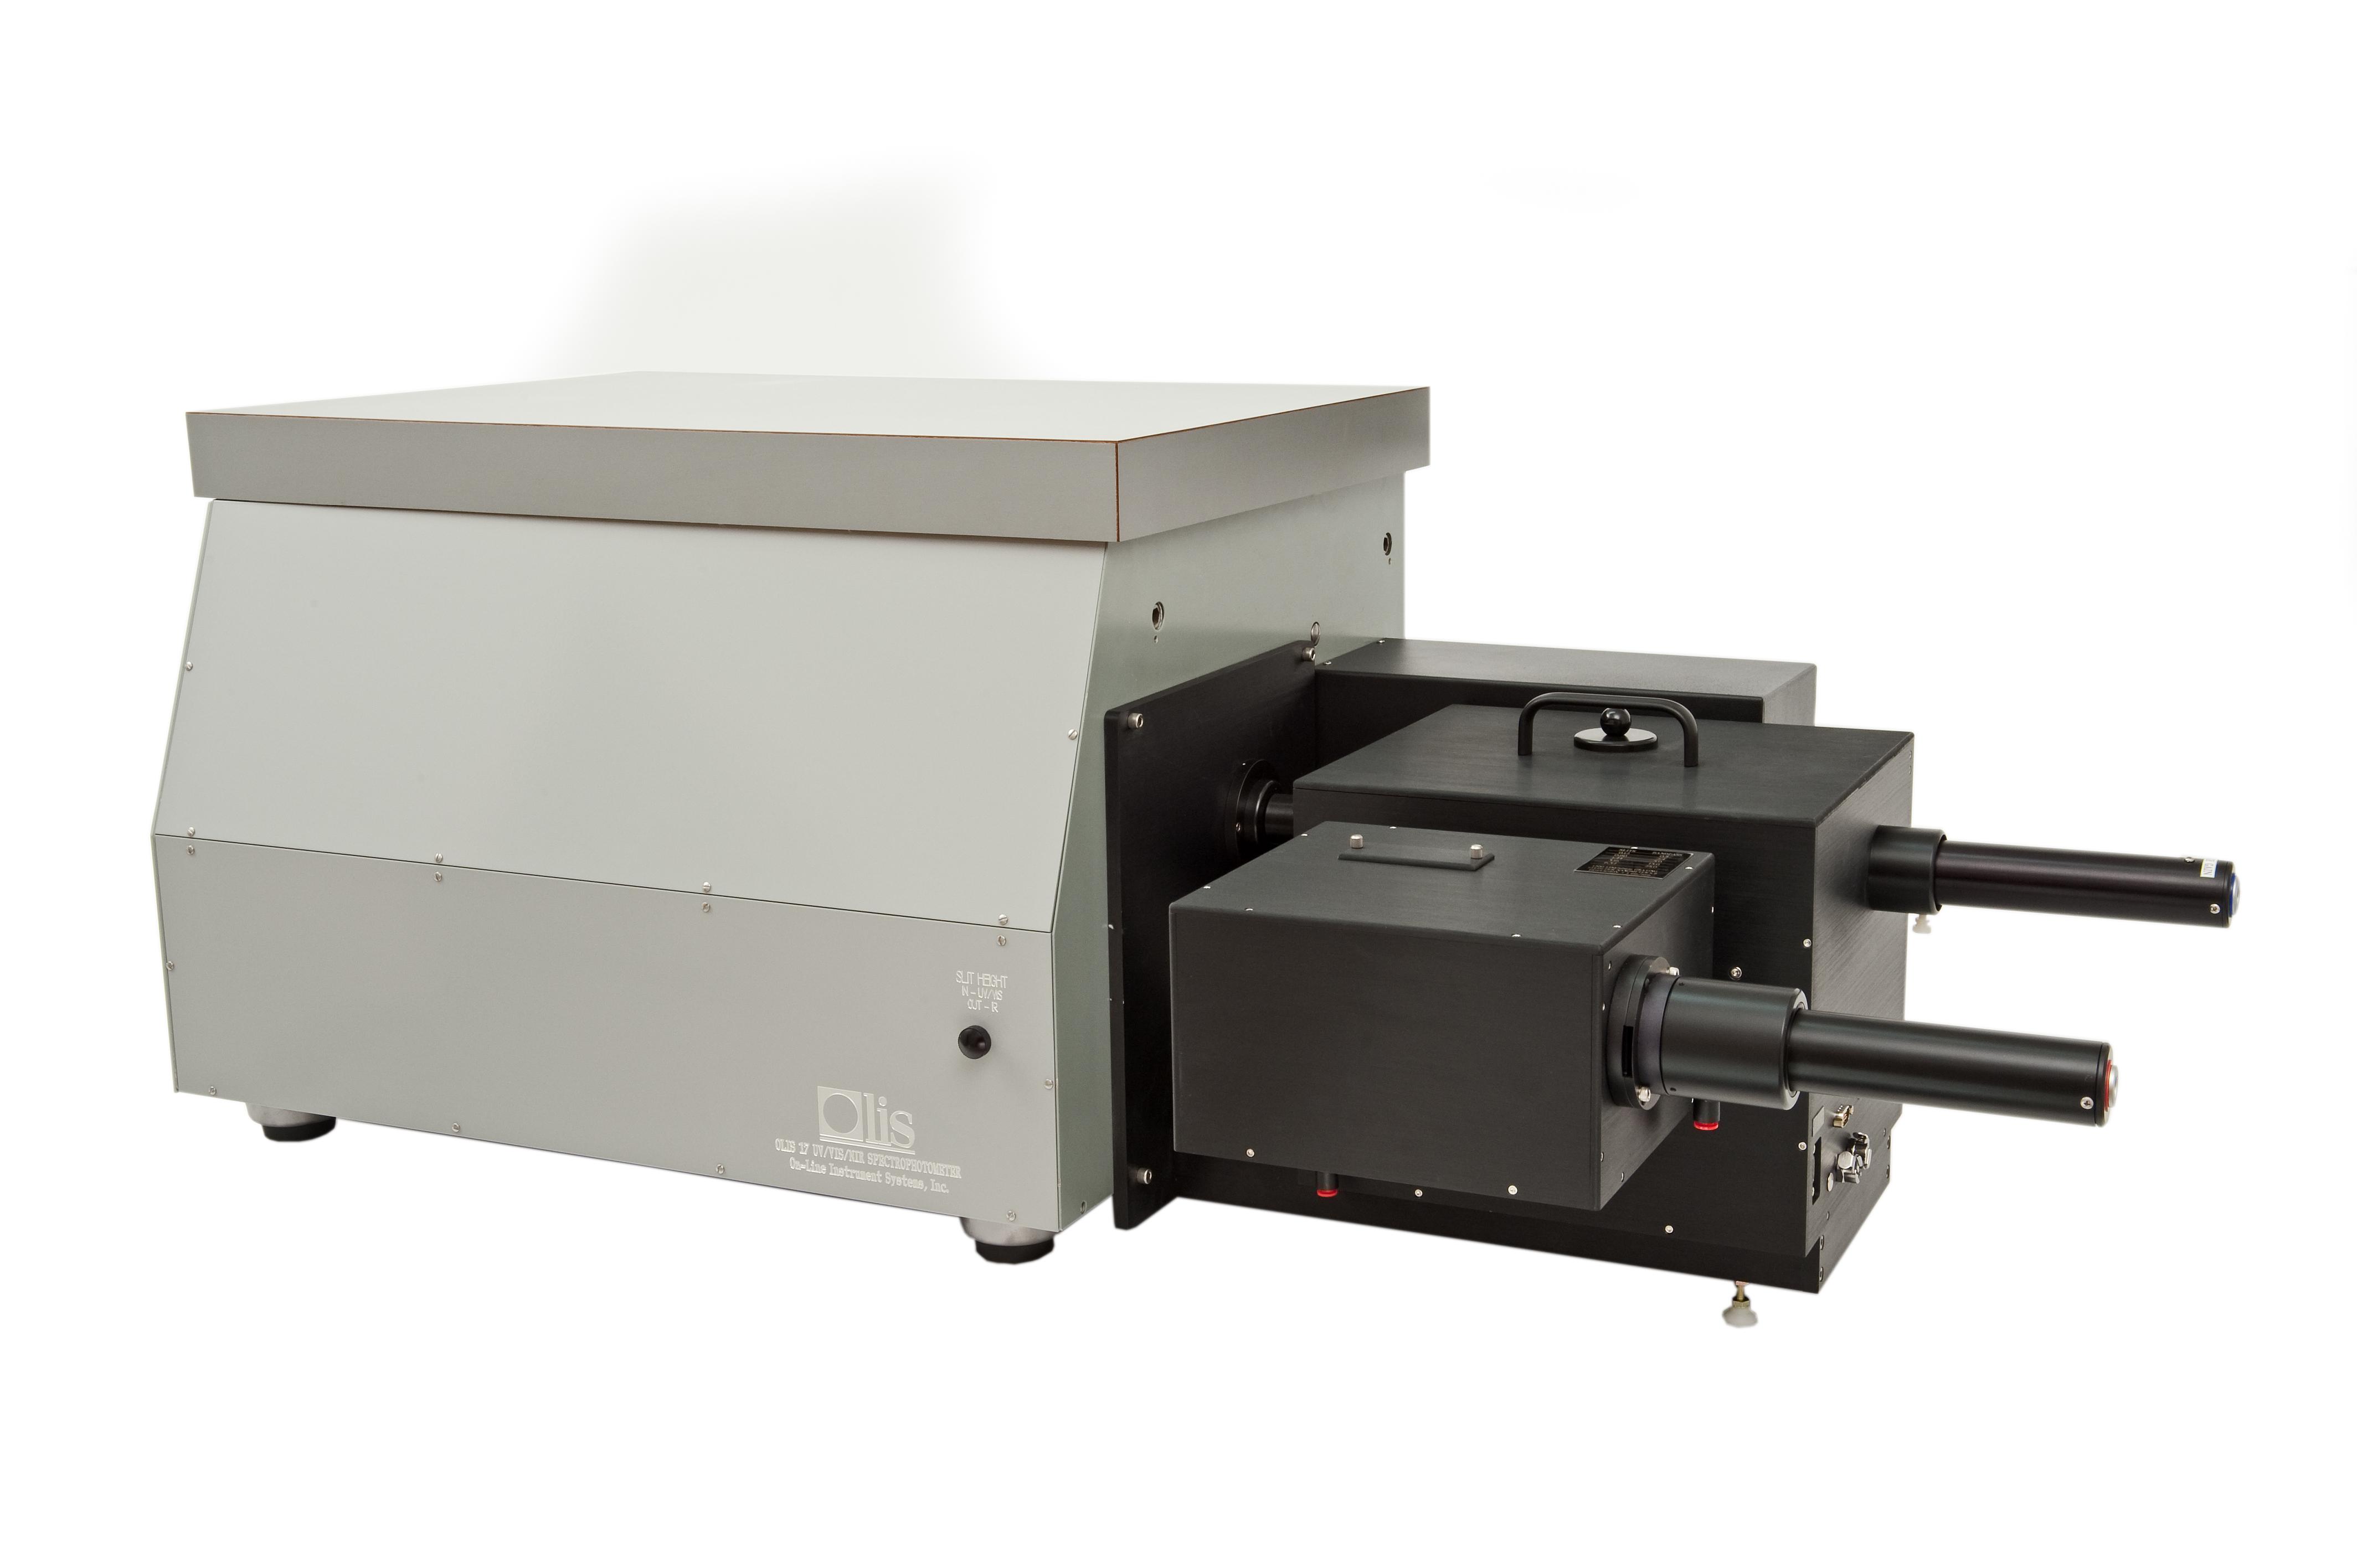 DSM 172 CPL圆偏振荧光光谱仪